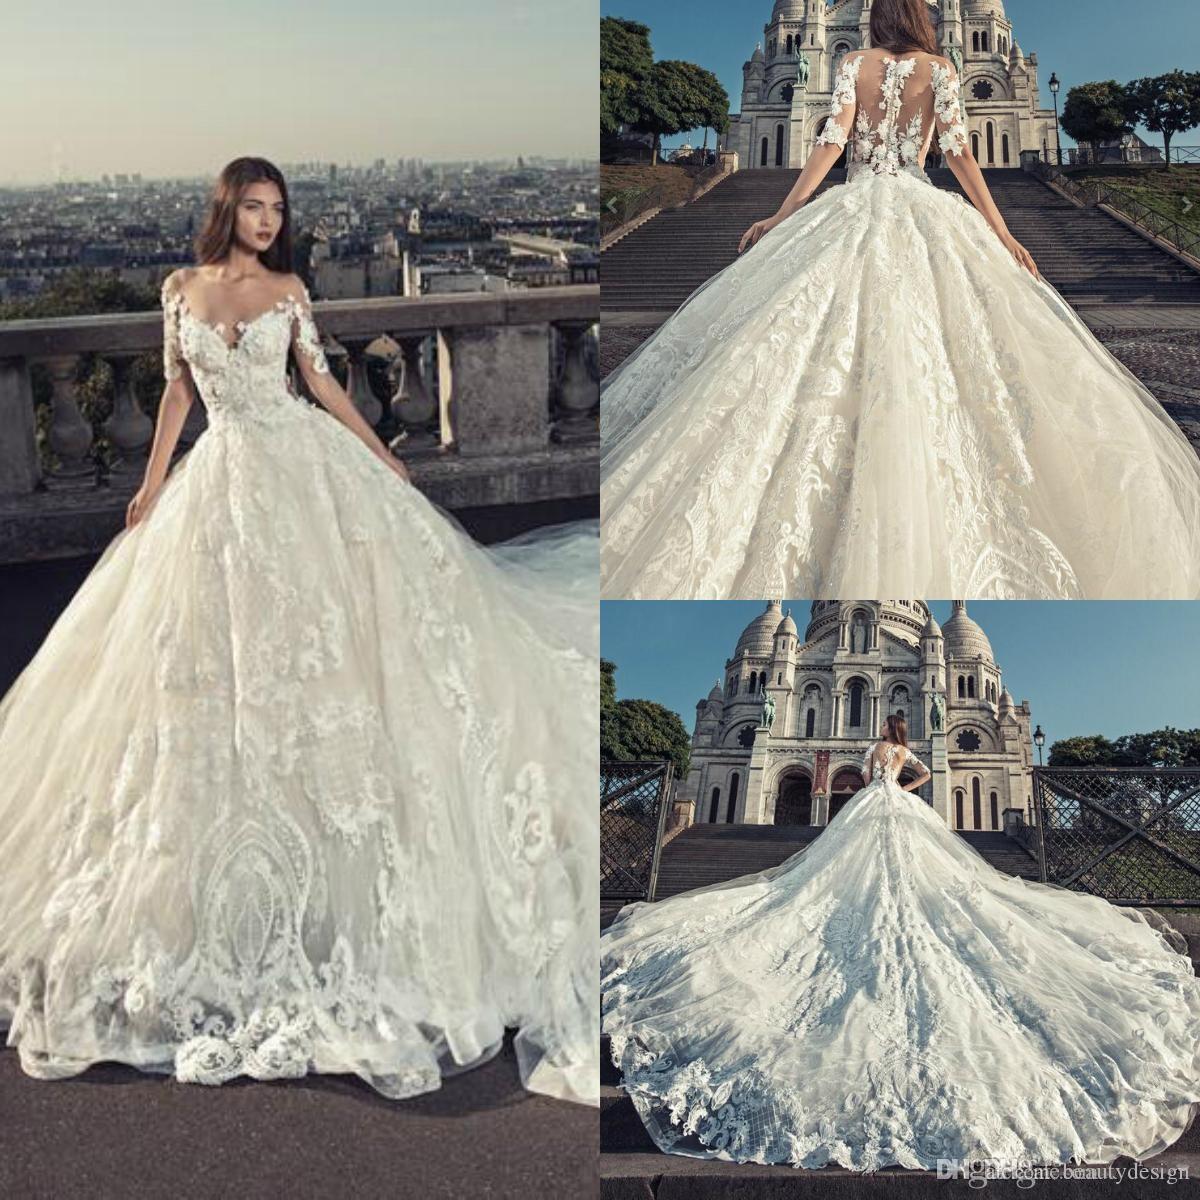 Julia Kontogruni 2020 Wedding Dresses Lace Applique Off Shoulder V Neck Beads Half Sleeve Bridal Gowns Chapel Length Plus Size Wedding Dress